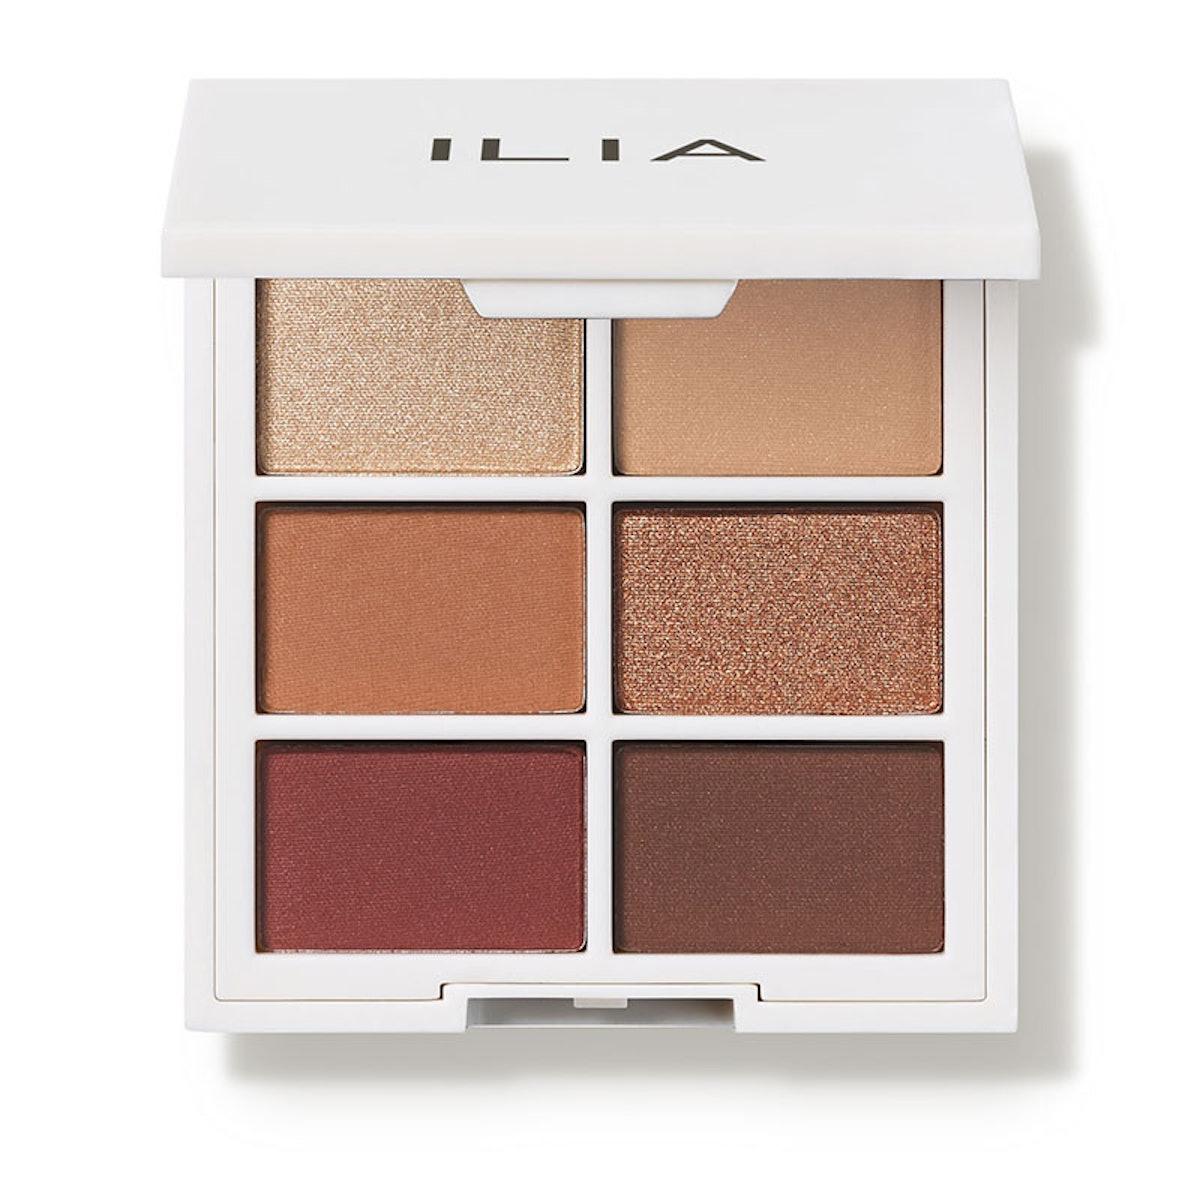 The Necessary Eyeshadow Palette - Warm Nude